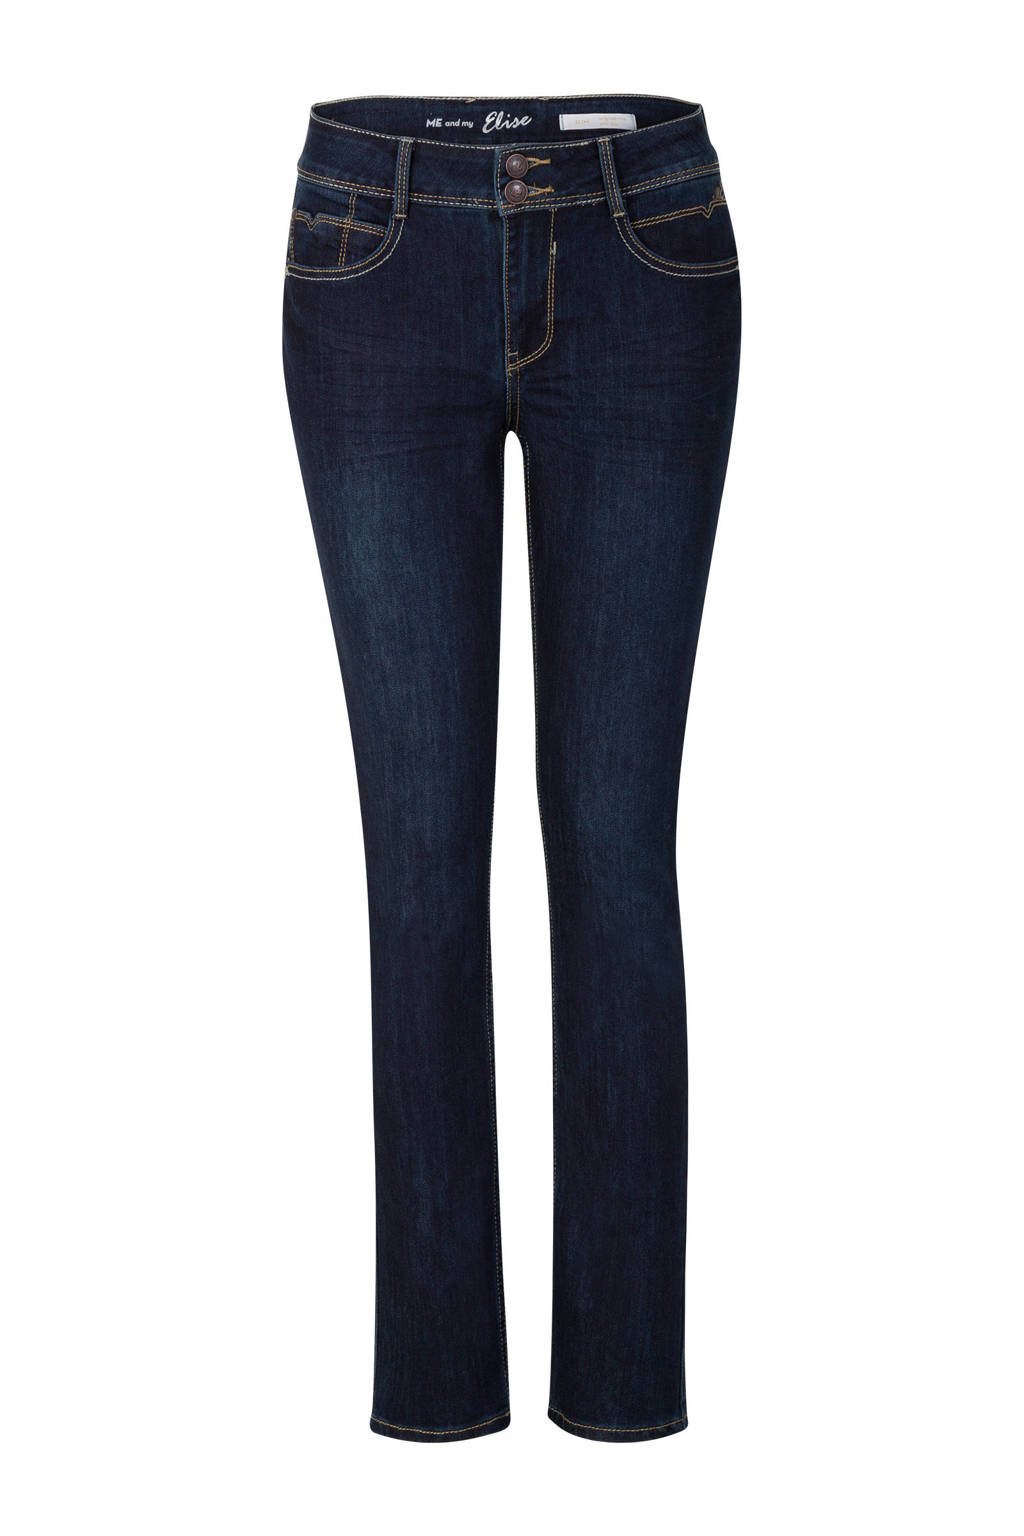 Miss Etam Regulier straight jeans Elise 28 inch, Blauw